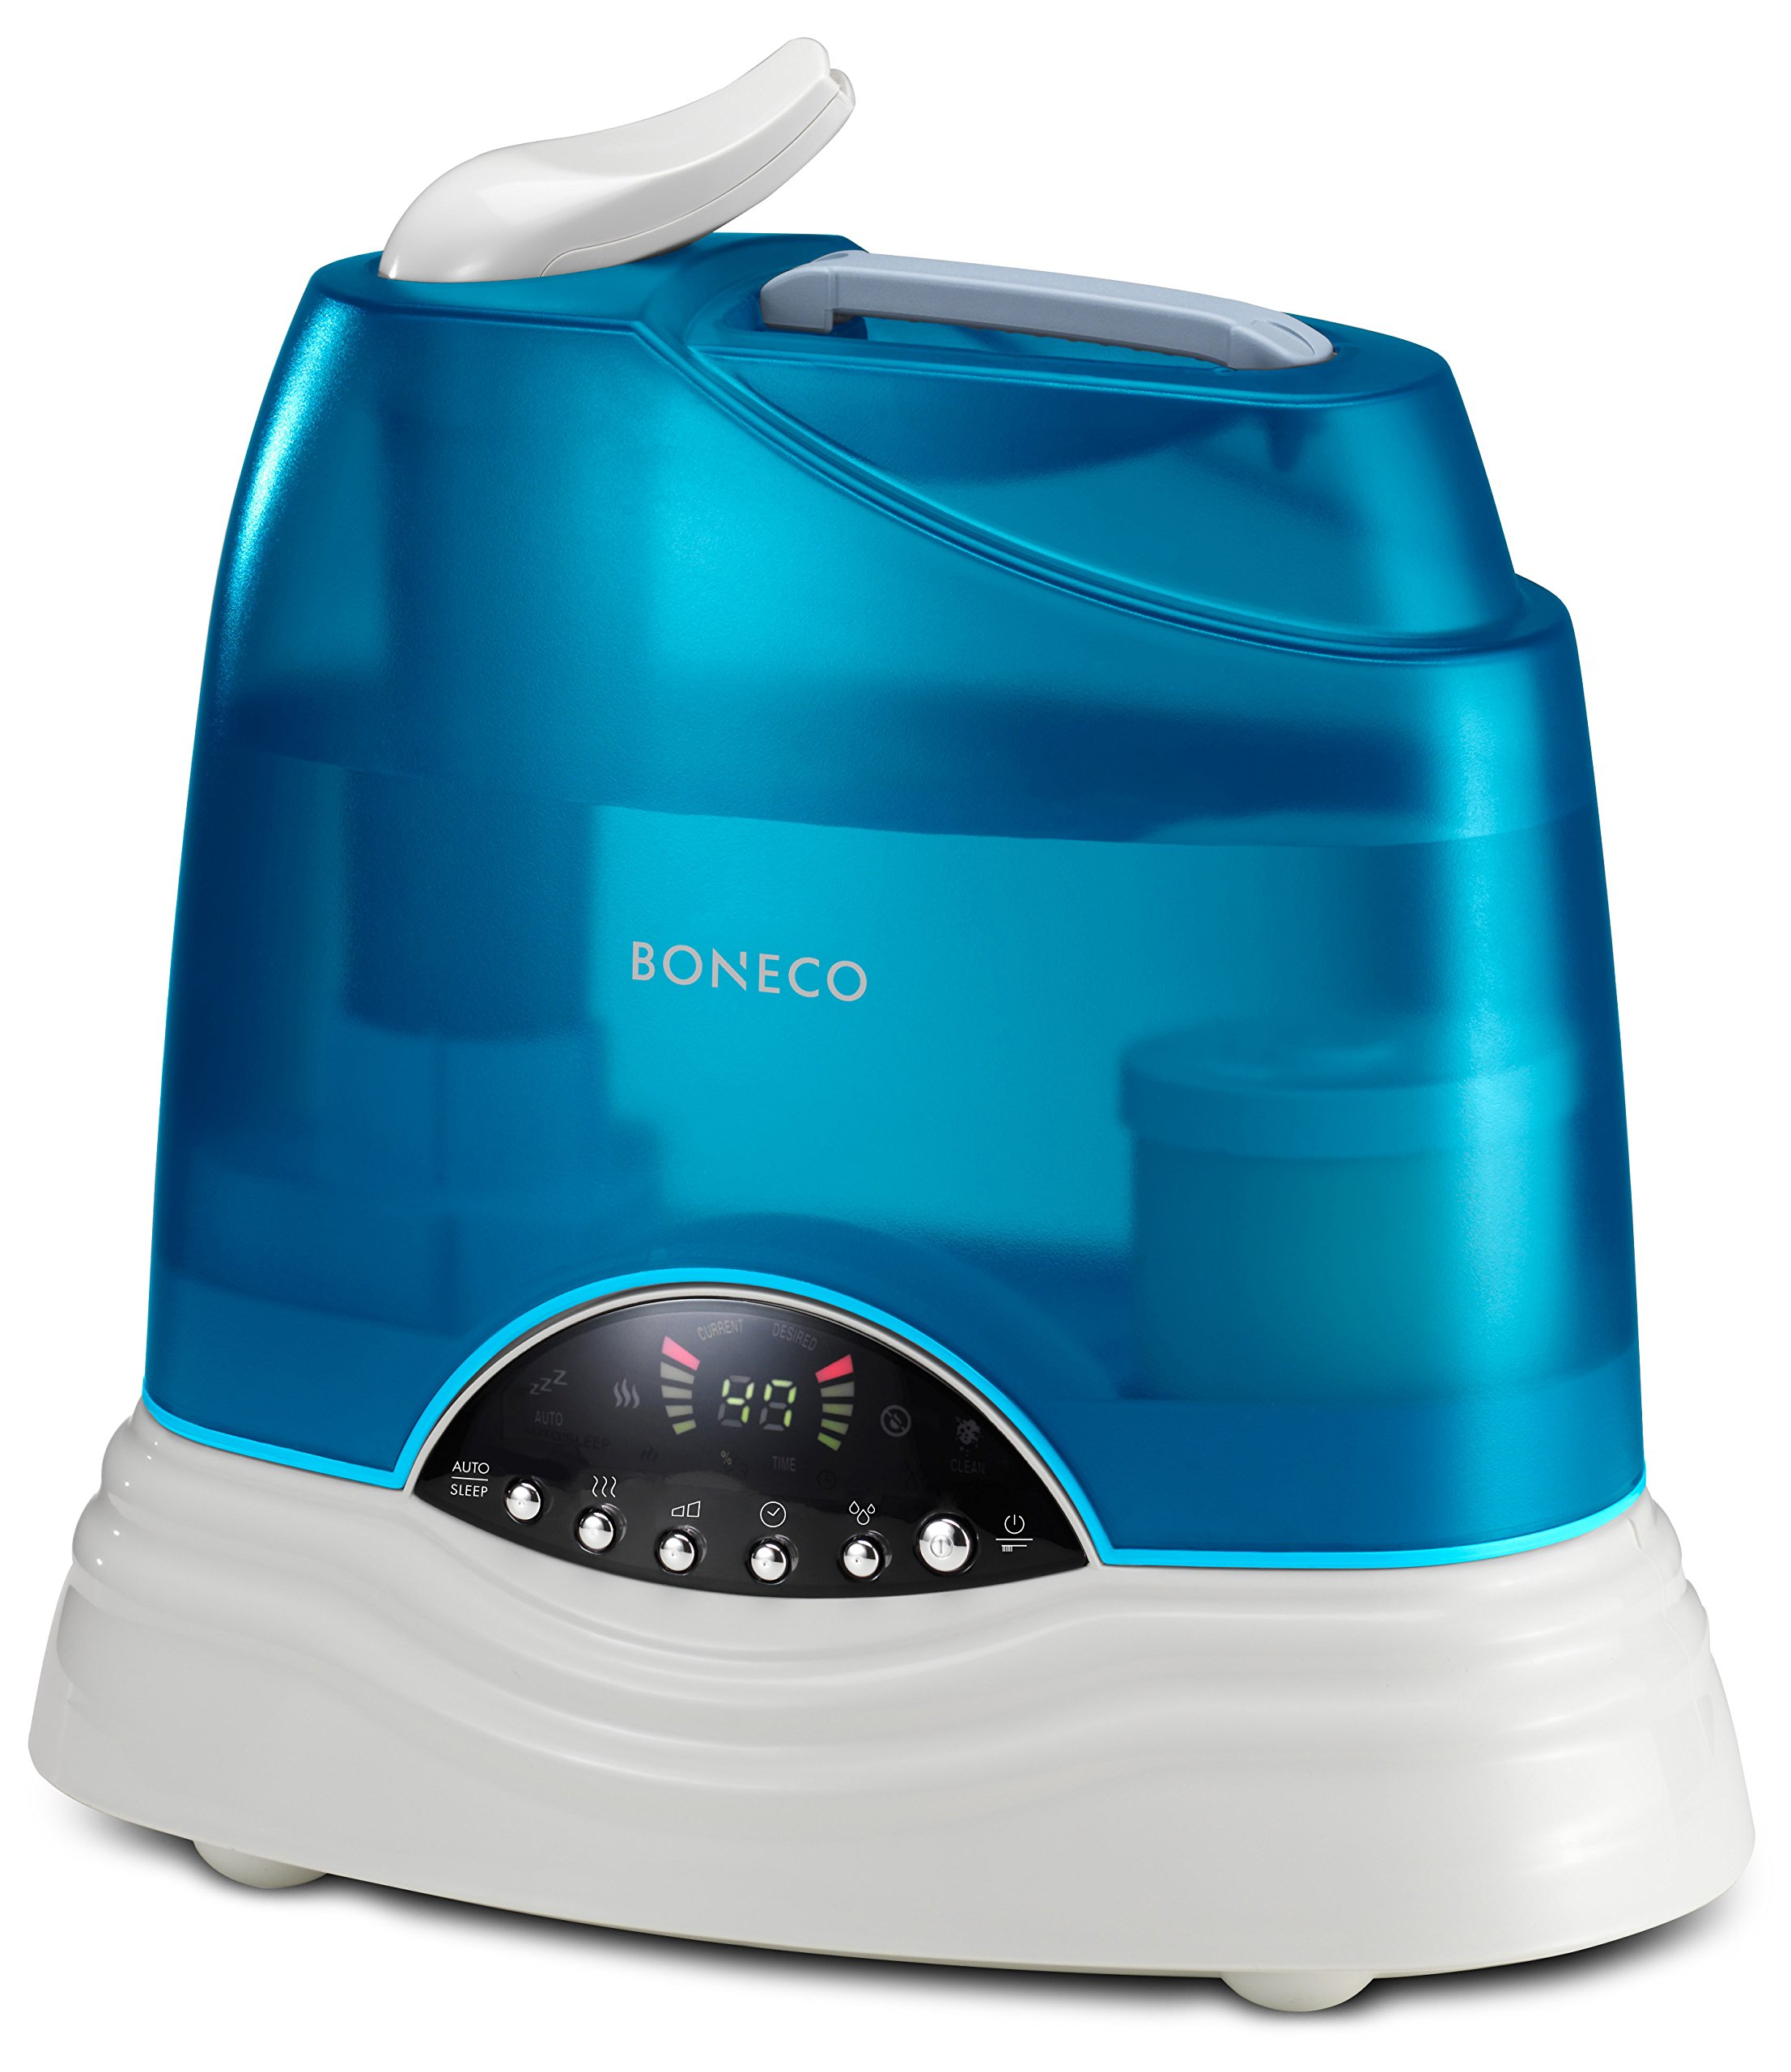 BONECO Warm or Cool Mist Ultrasonic Humidifier 7135 by BONECO